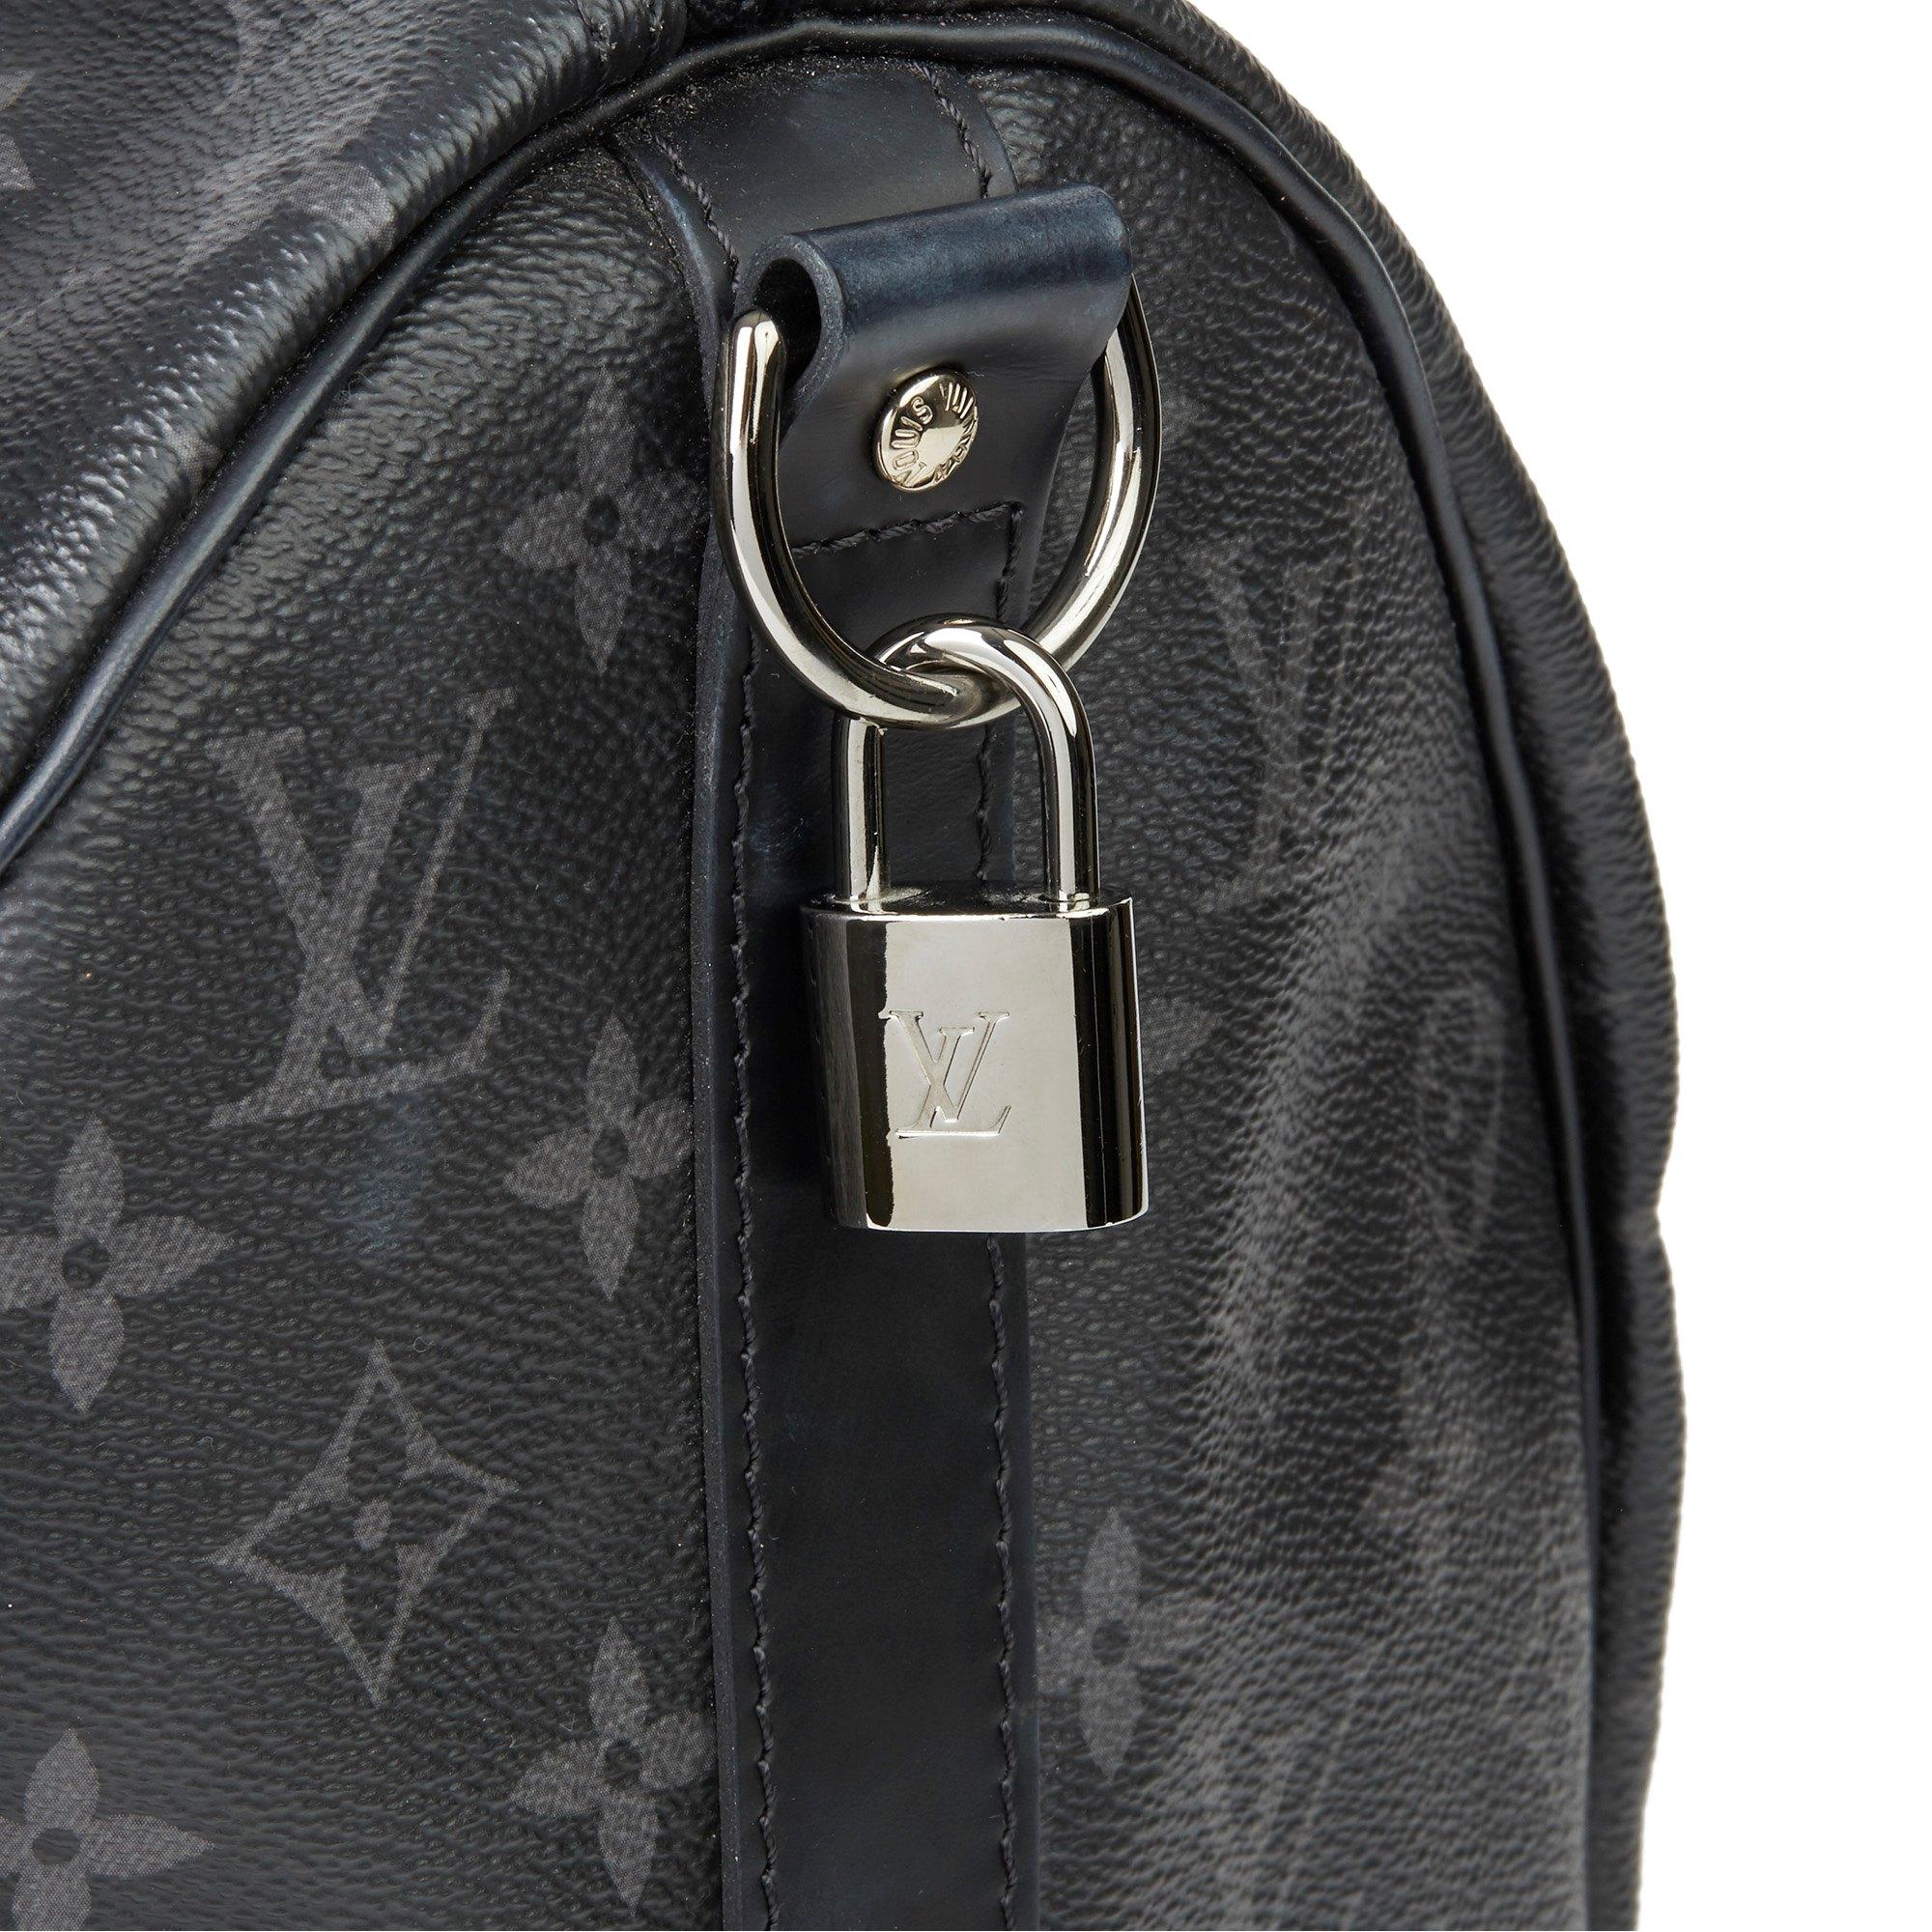 Louis Vuitton Eclipse Monogram Coated Canvas & Cowhide Leather Keepall Bandoulière 45